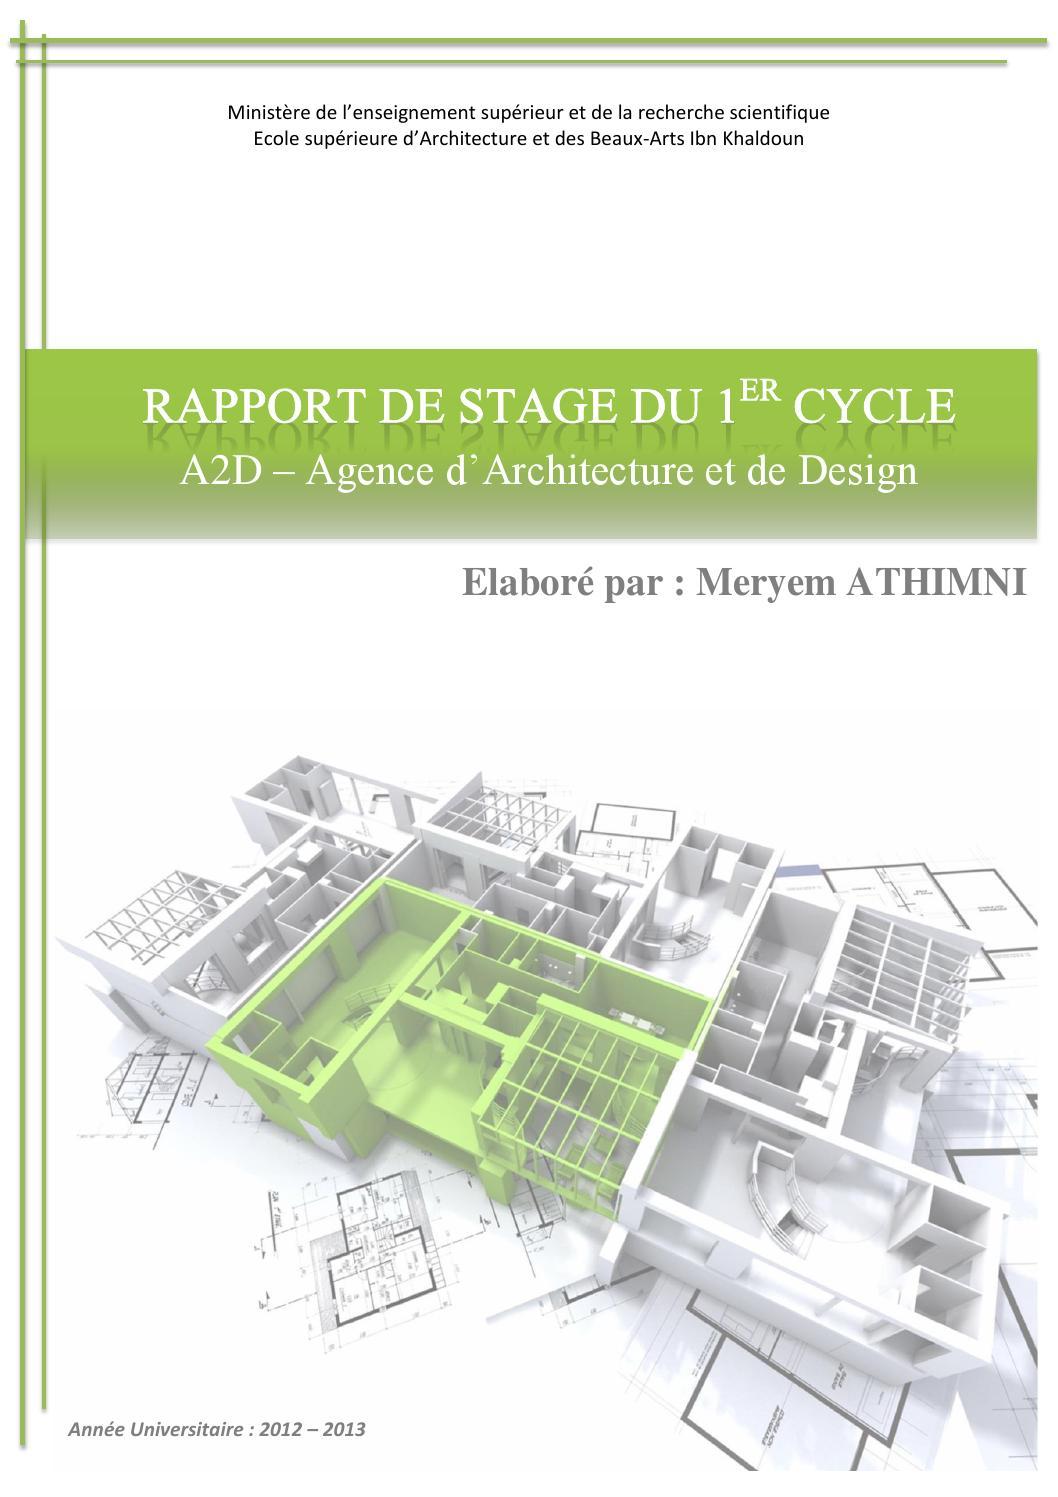 Rapport de stage by Meryem Athimni - issuu